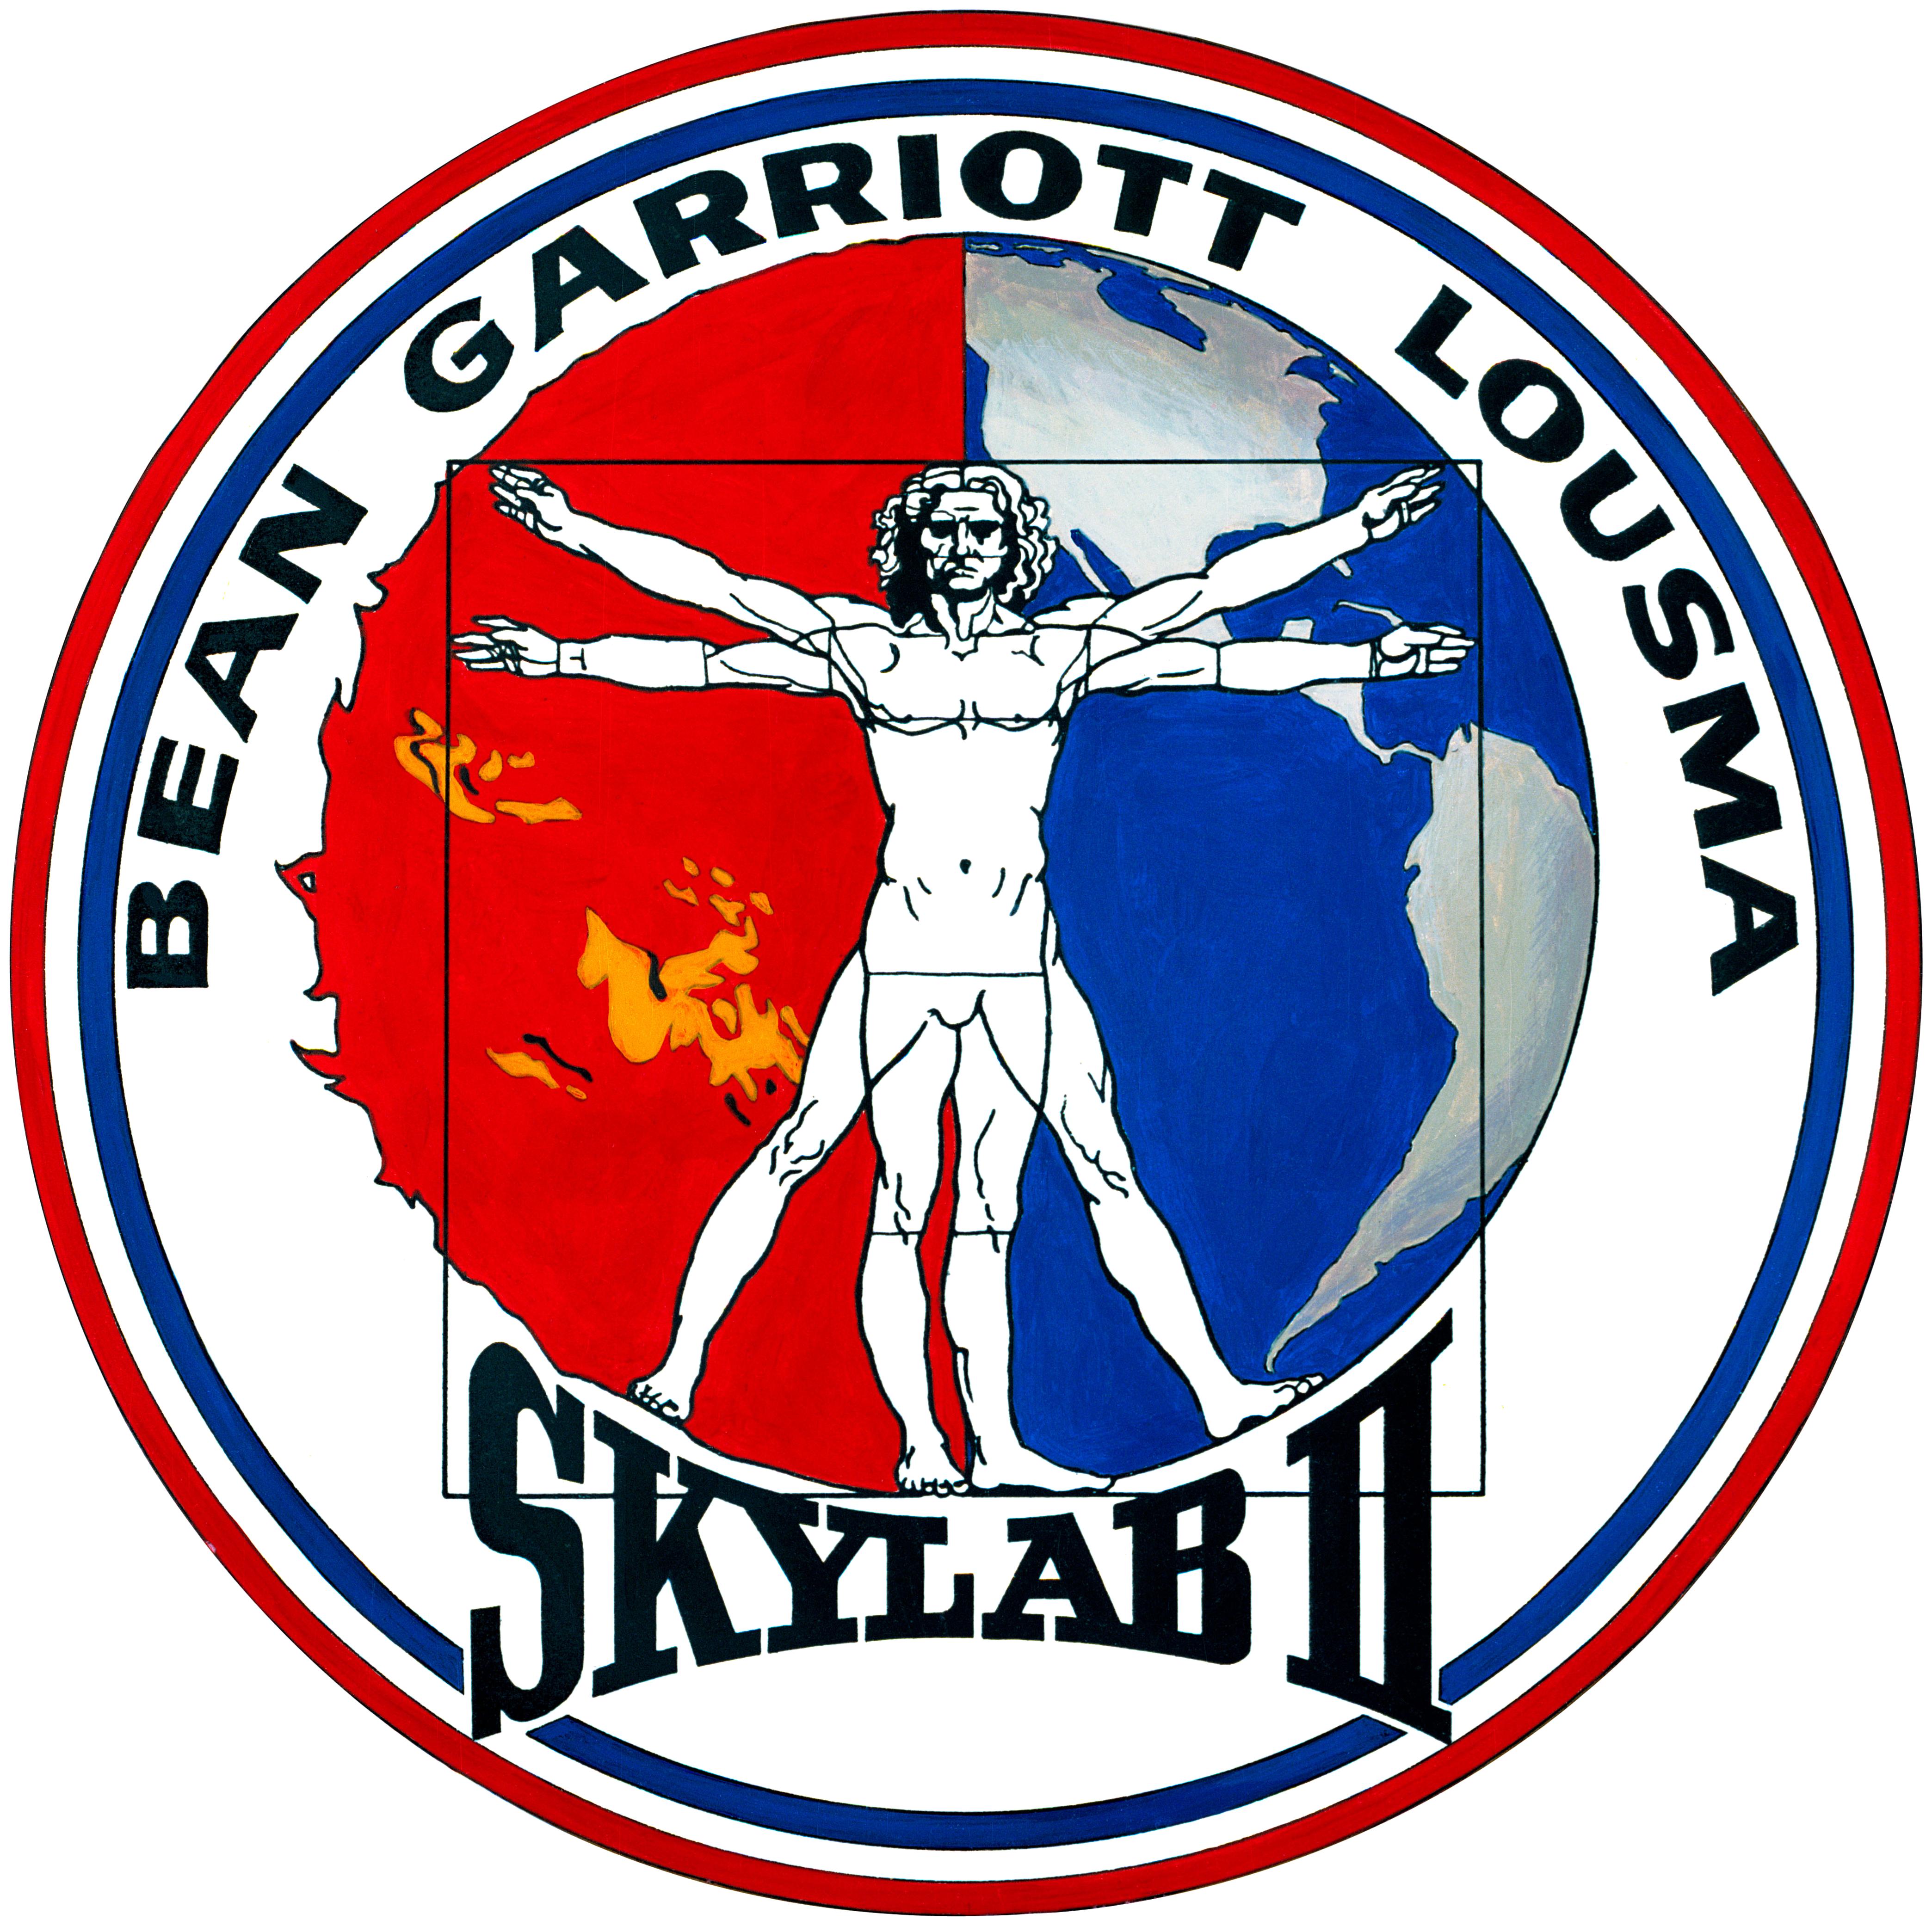 Désintégration de Skylab - 11.7.1979 Skylab2-Patch